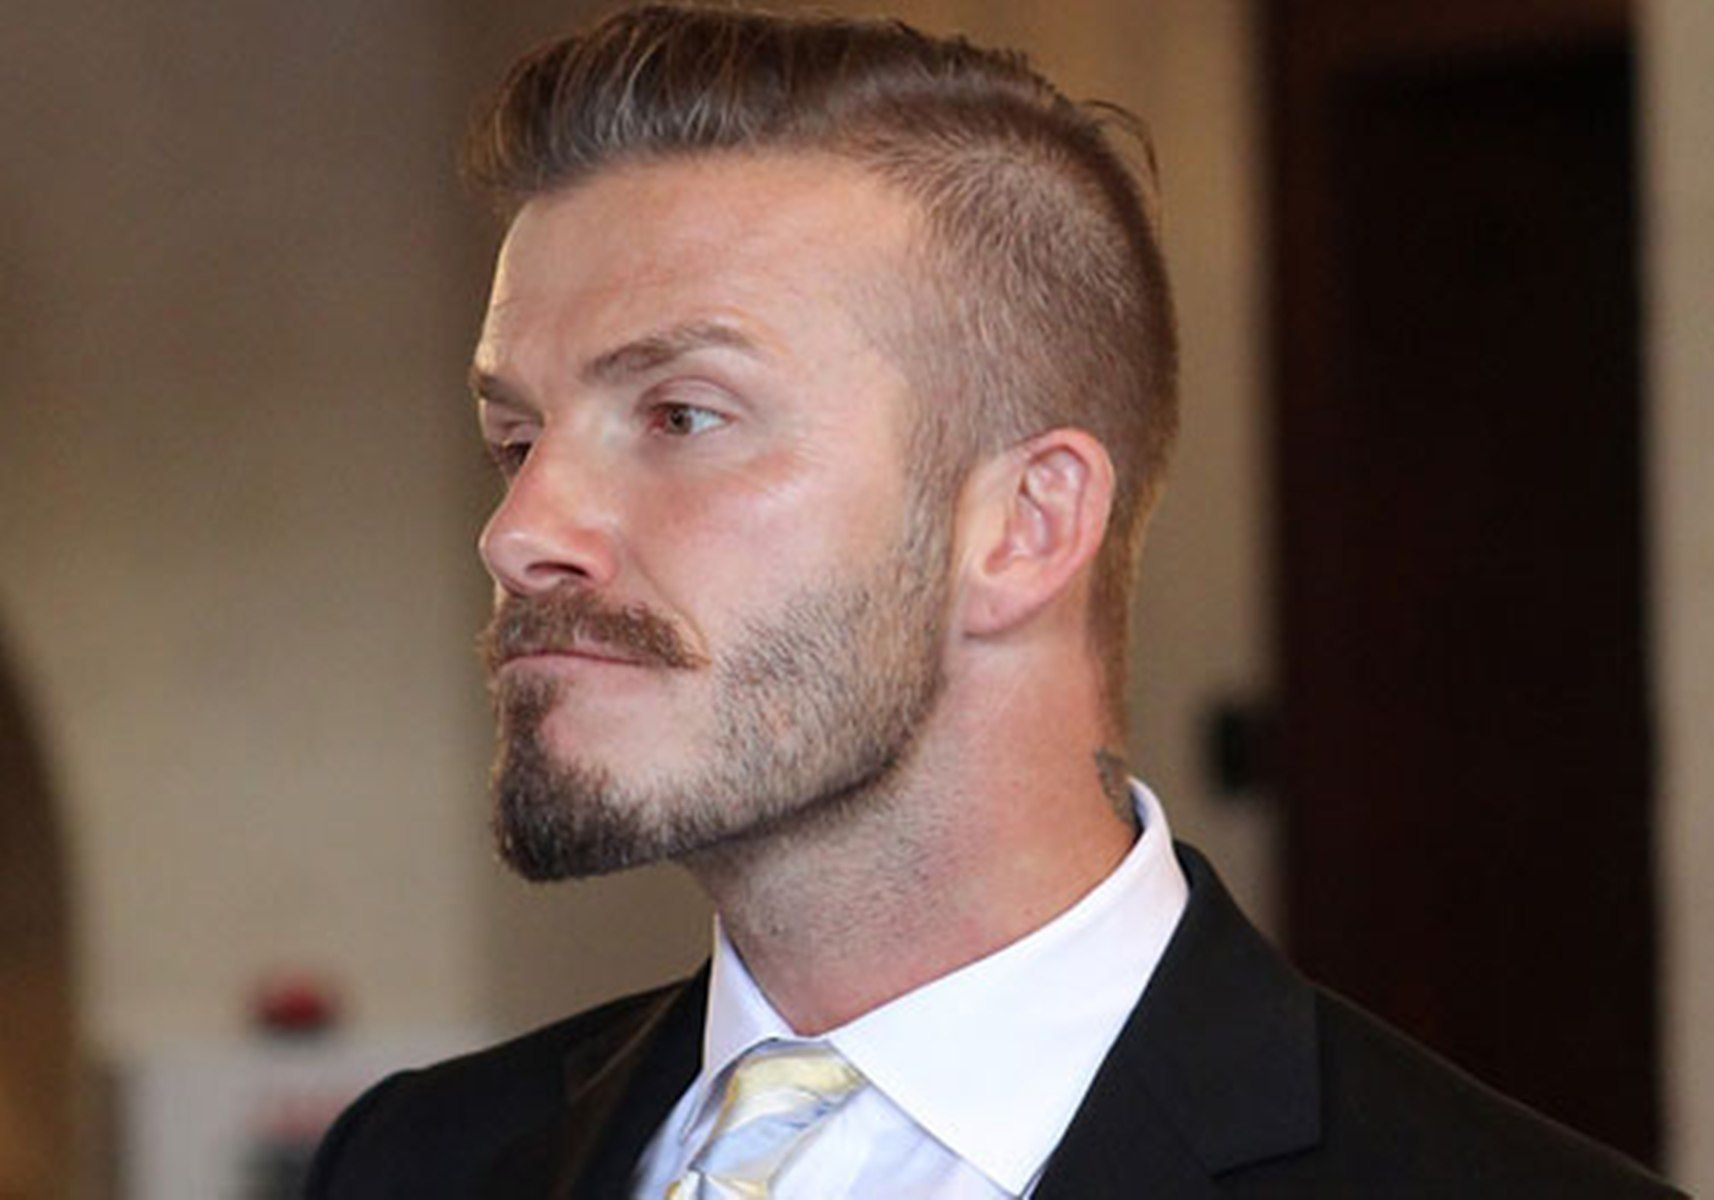 David Beckham Fade Haircut People Faces Pinterest Undercut